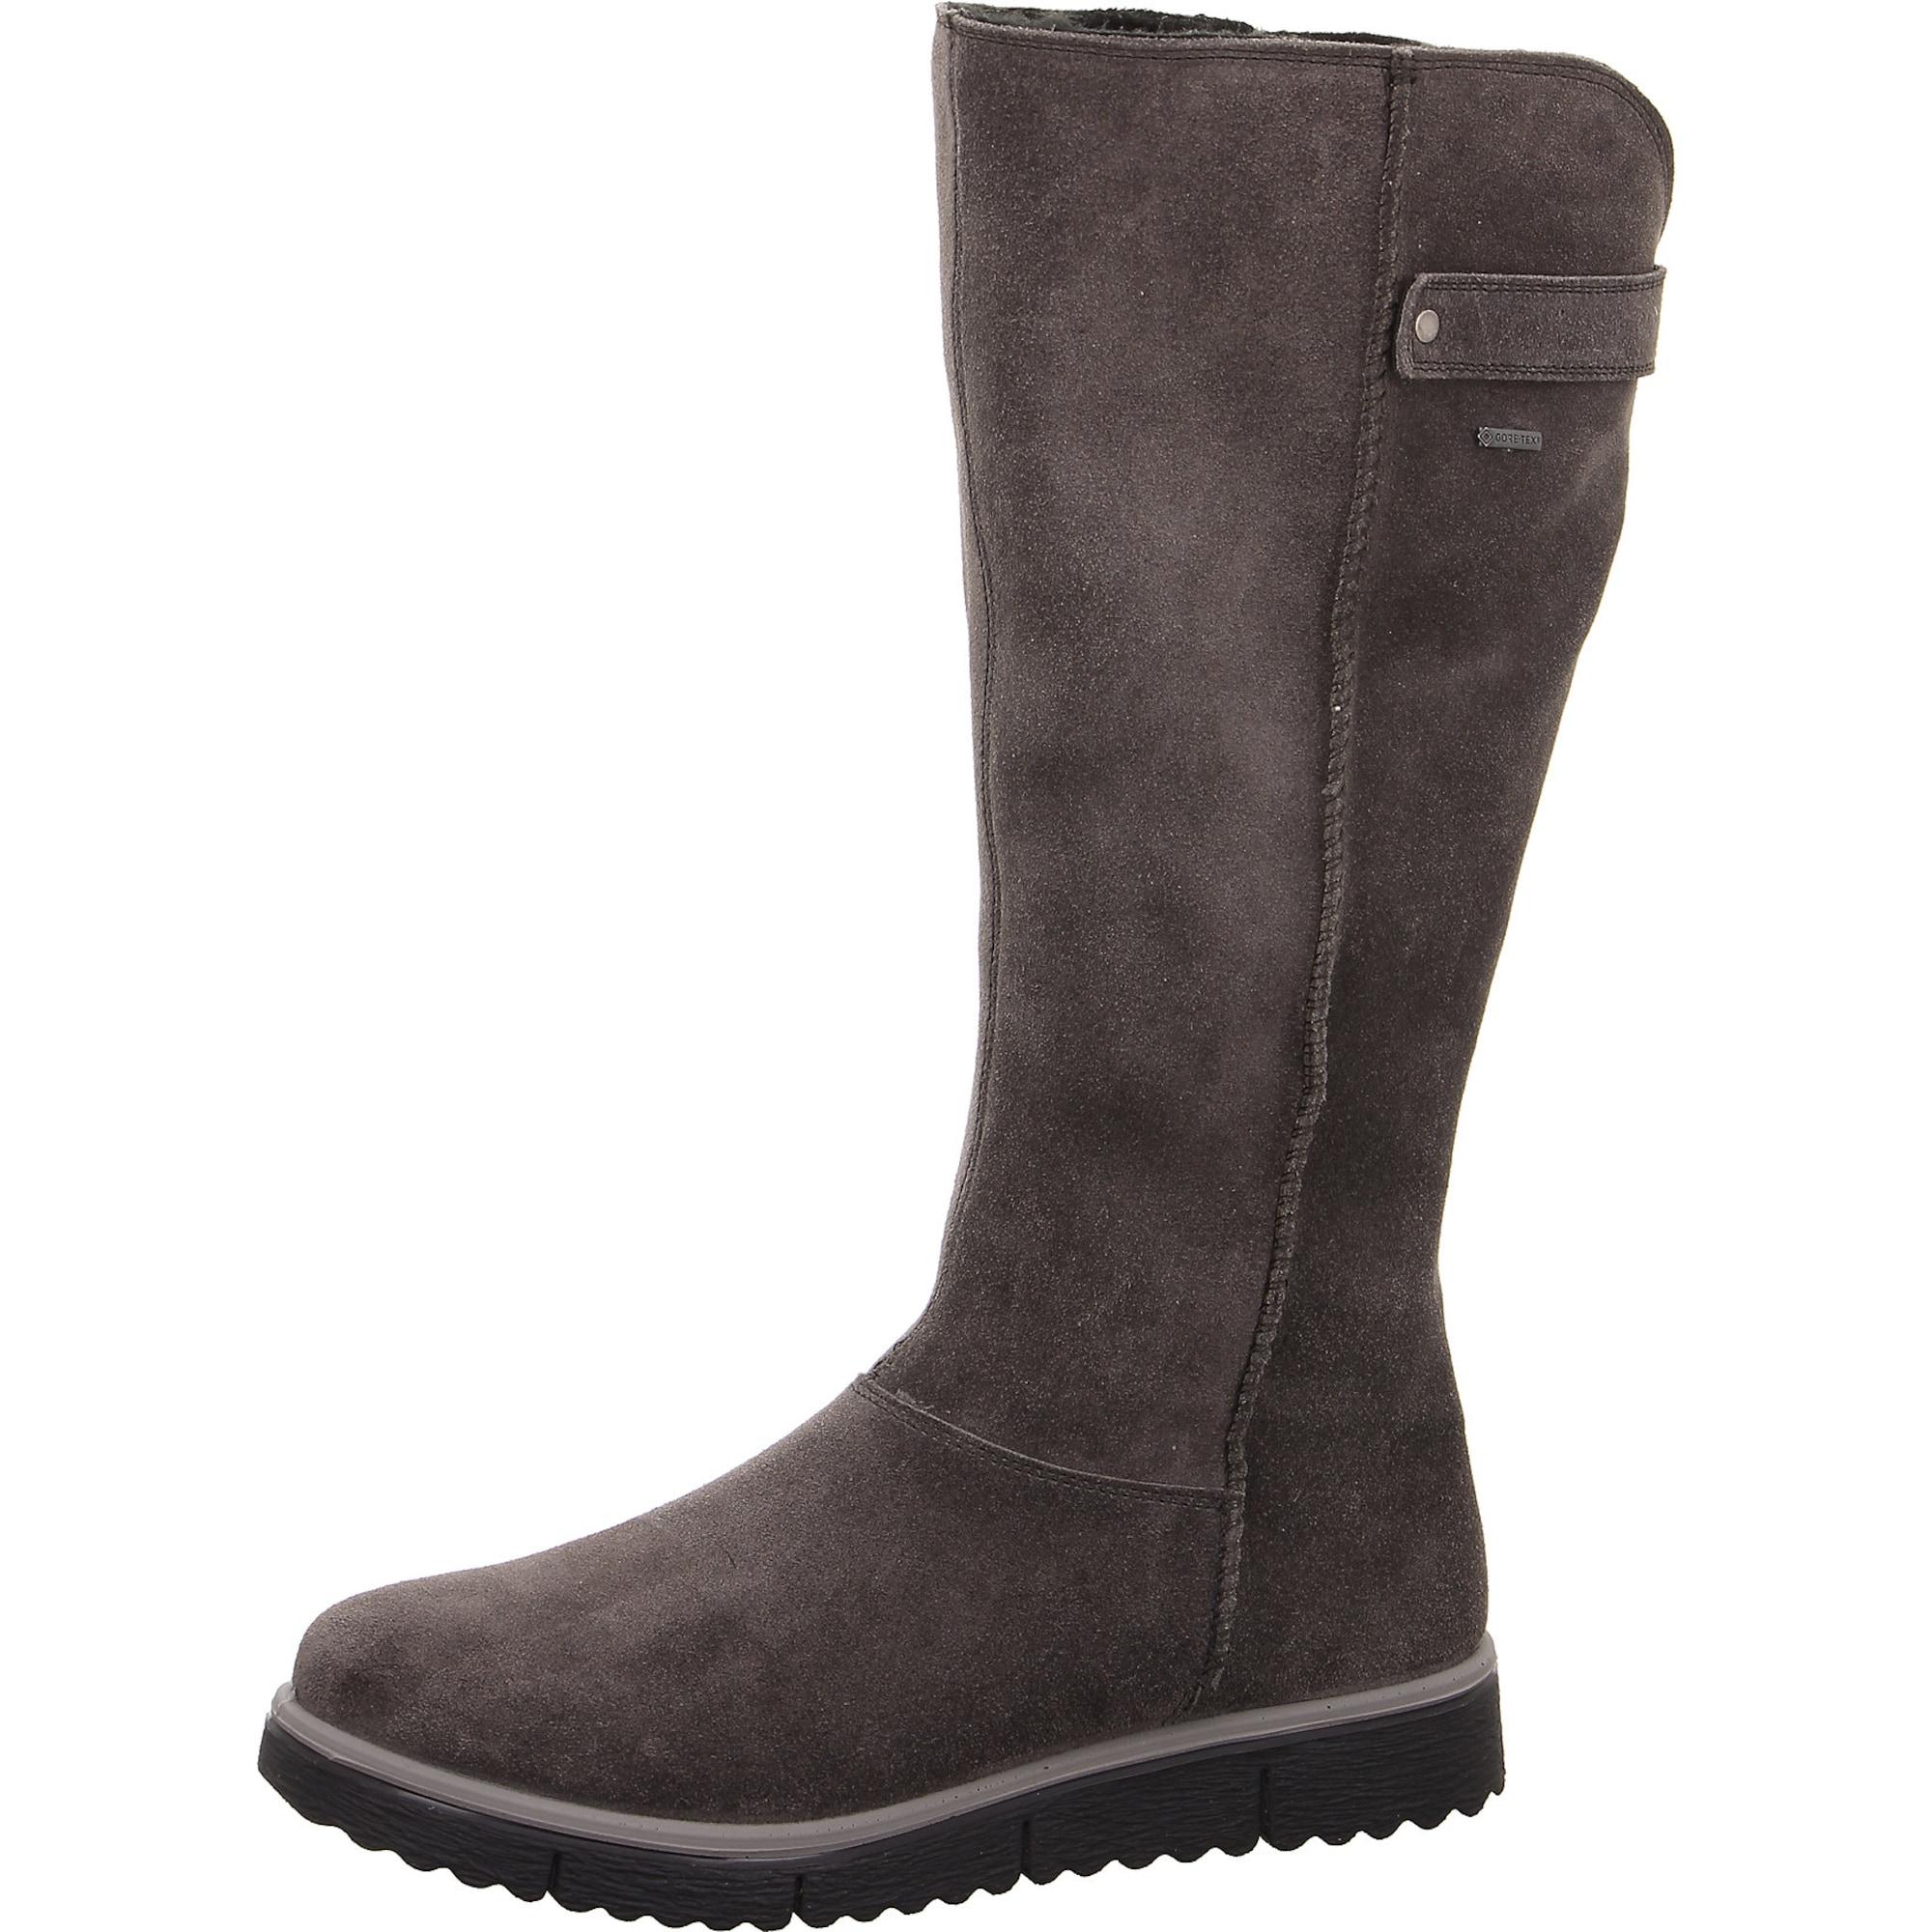 Winterstiefel 'CAMPANIA'   Schuhe > Stiefel > Winterstiefel   Legero